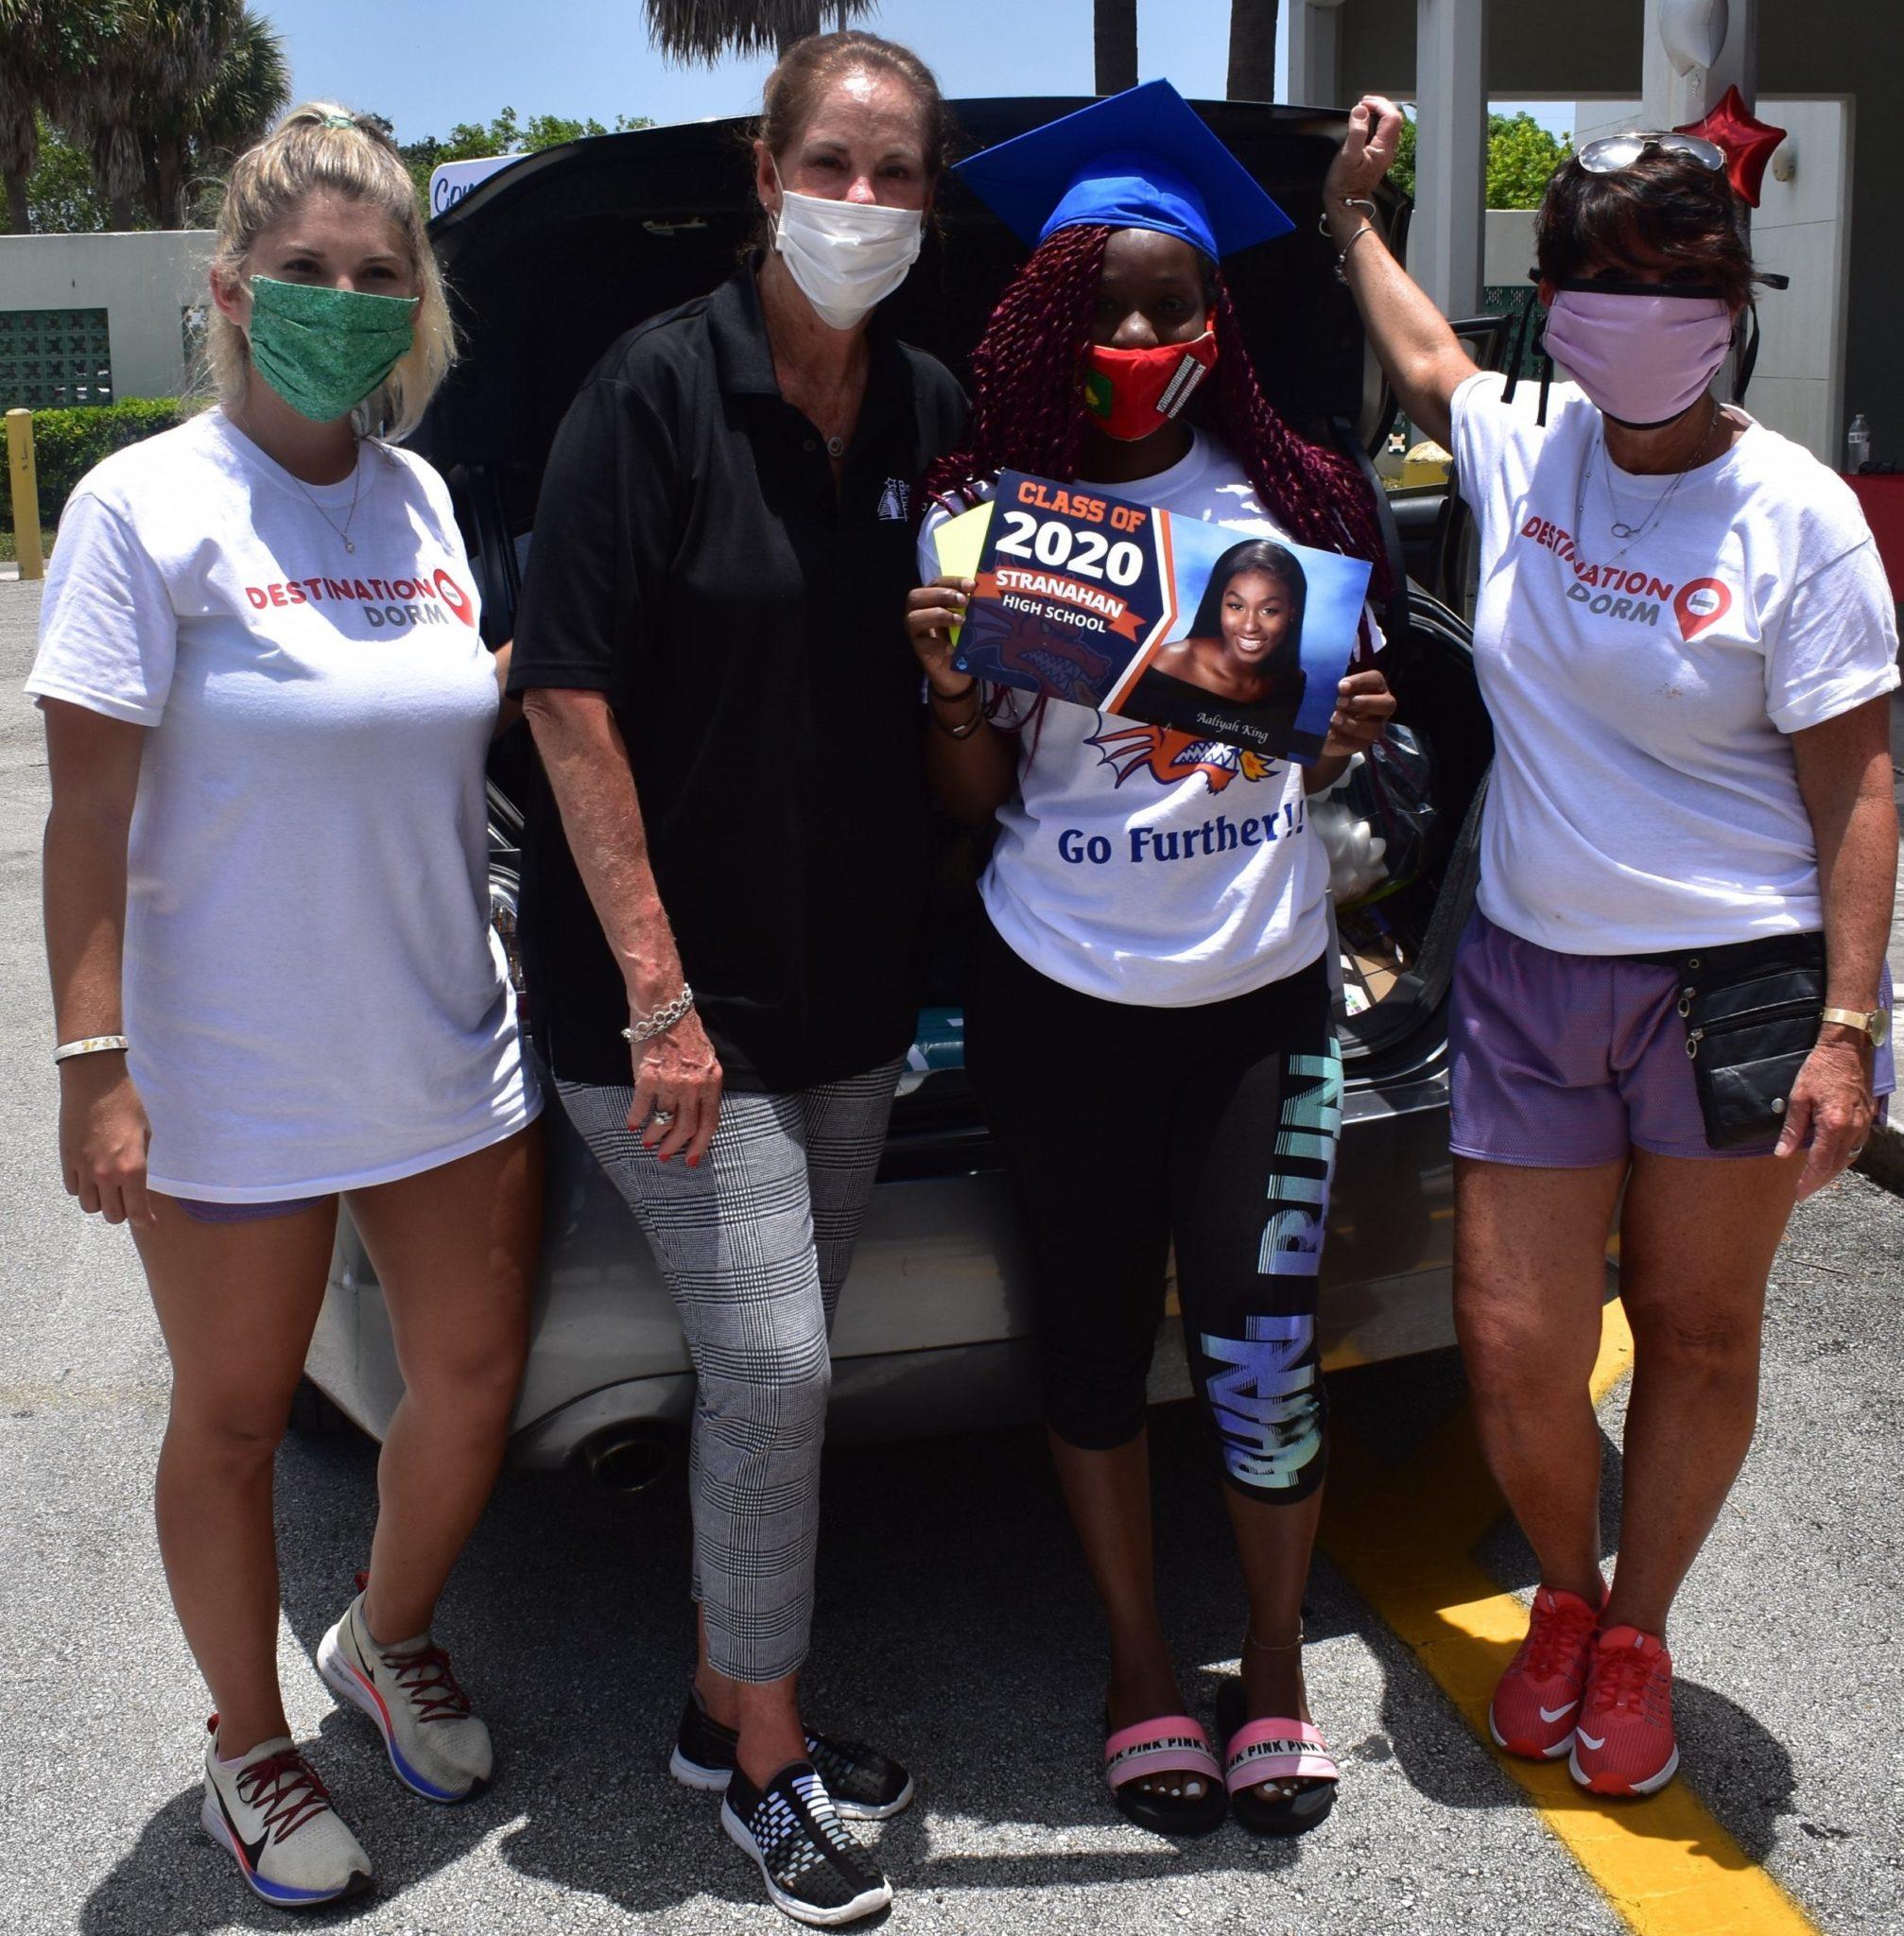 Destination Dorm's Jamie Raff; Broward Education Foundation Executive Director Shea Ciriago; Aaliyah King, a graduate of Stranahan High School who will be attending FSU; and Meryl Raff of Destination Dorm